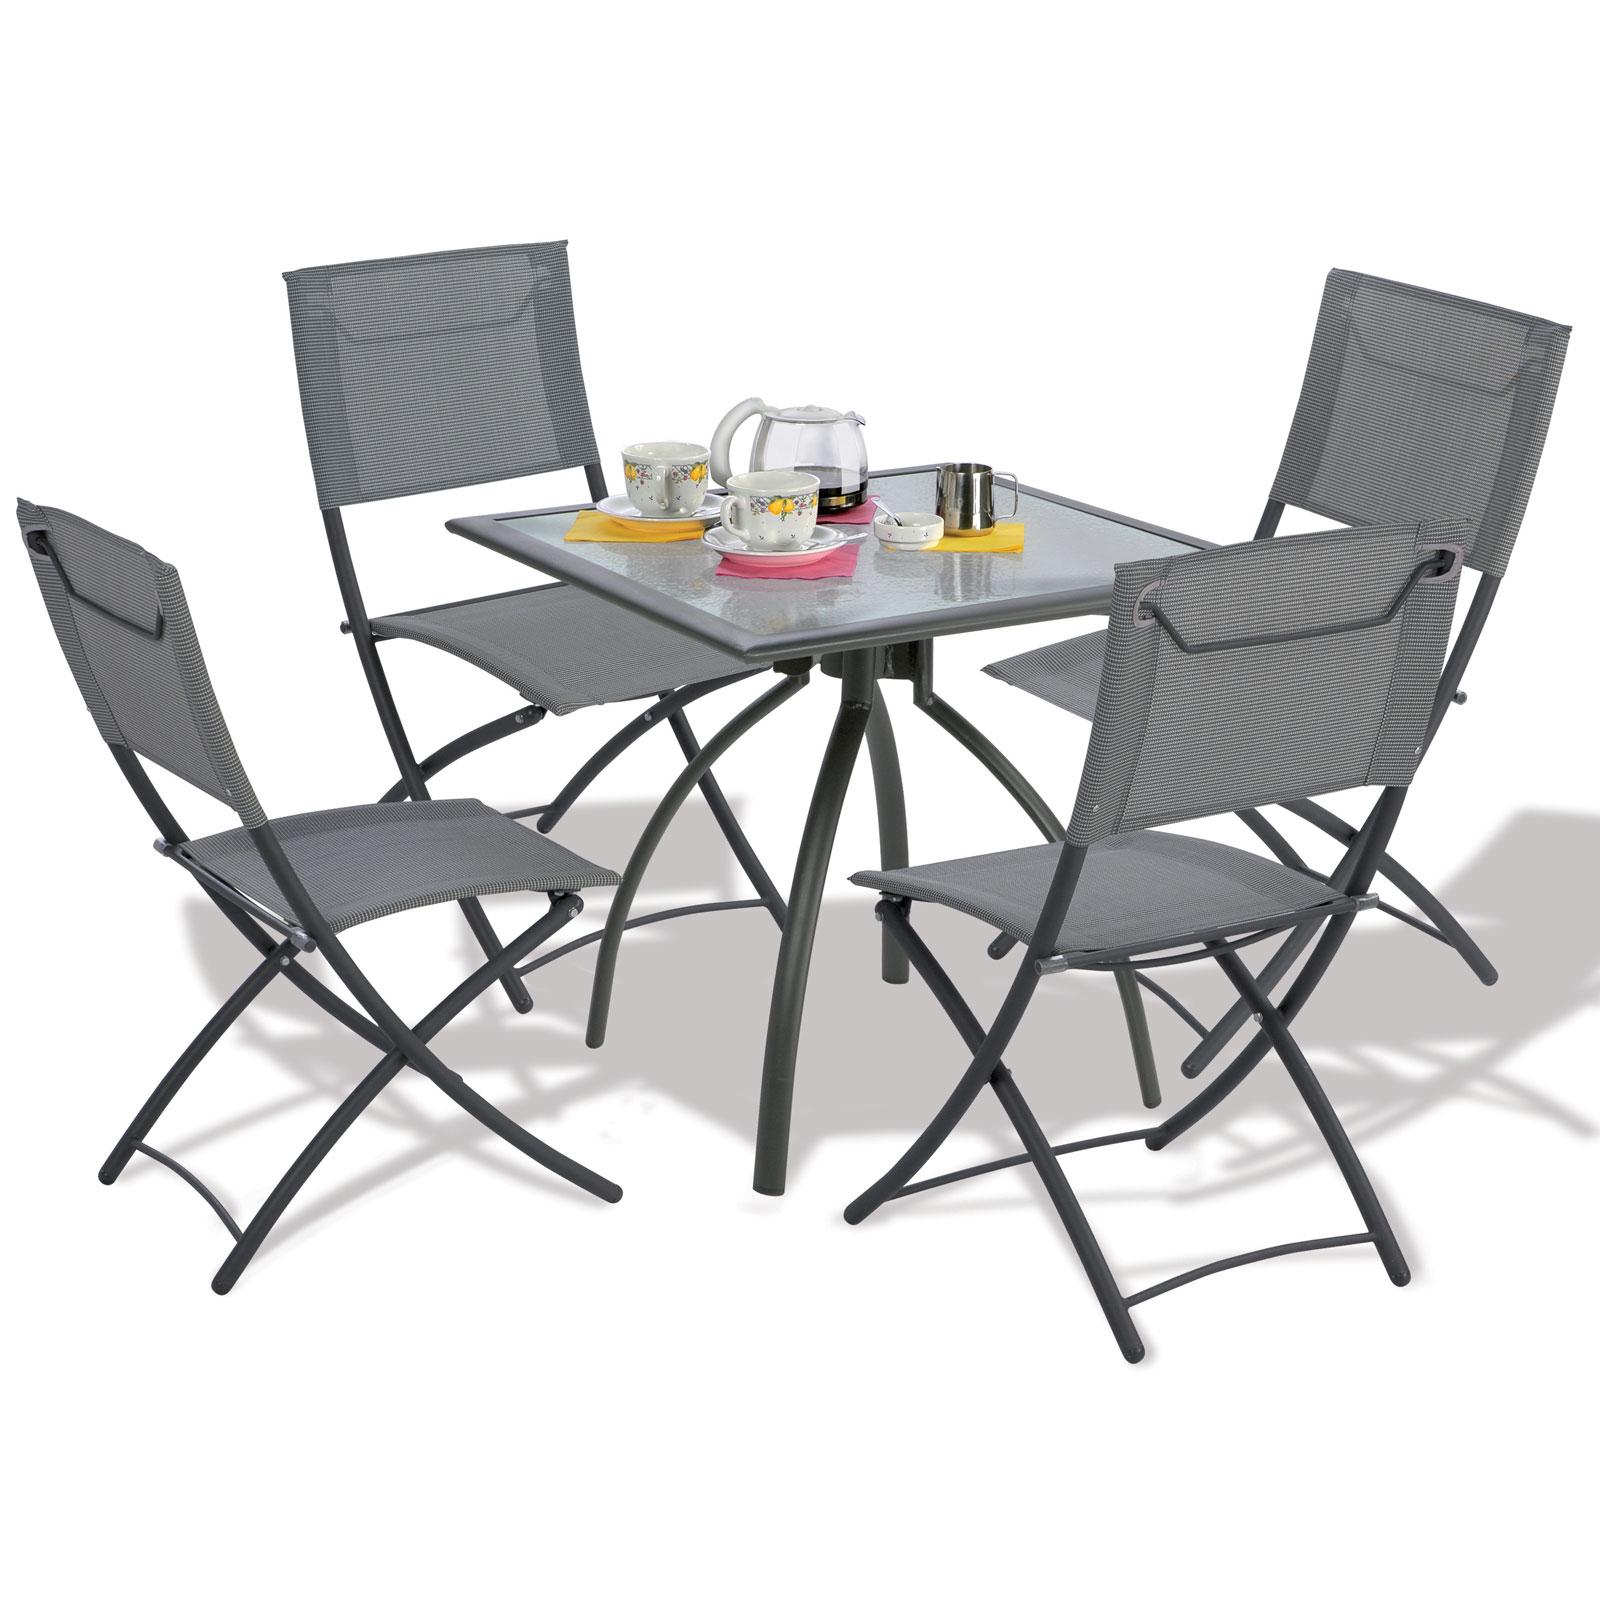 Table avec chaise de jardin - Mailleraye.fr jardin